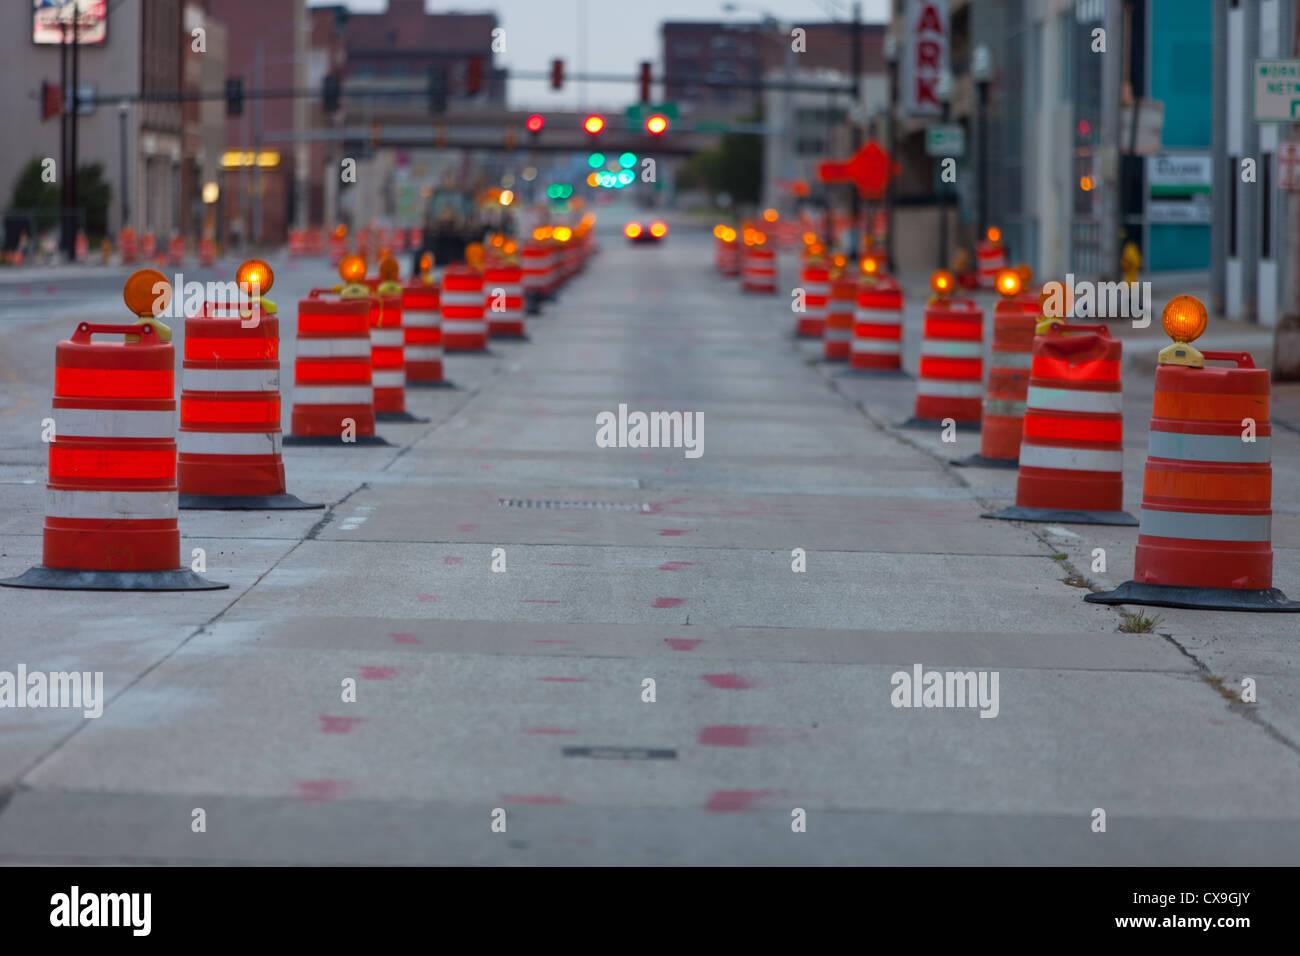 Orange barrels mark a road construction zone in downtown Peoria, IL. - Stock Image